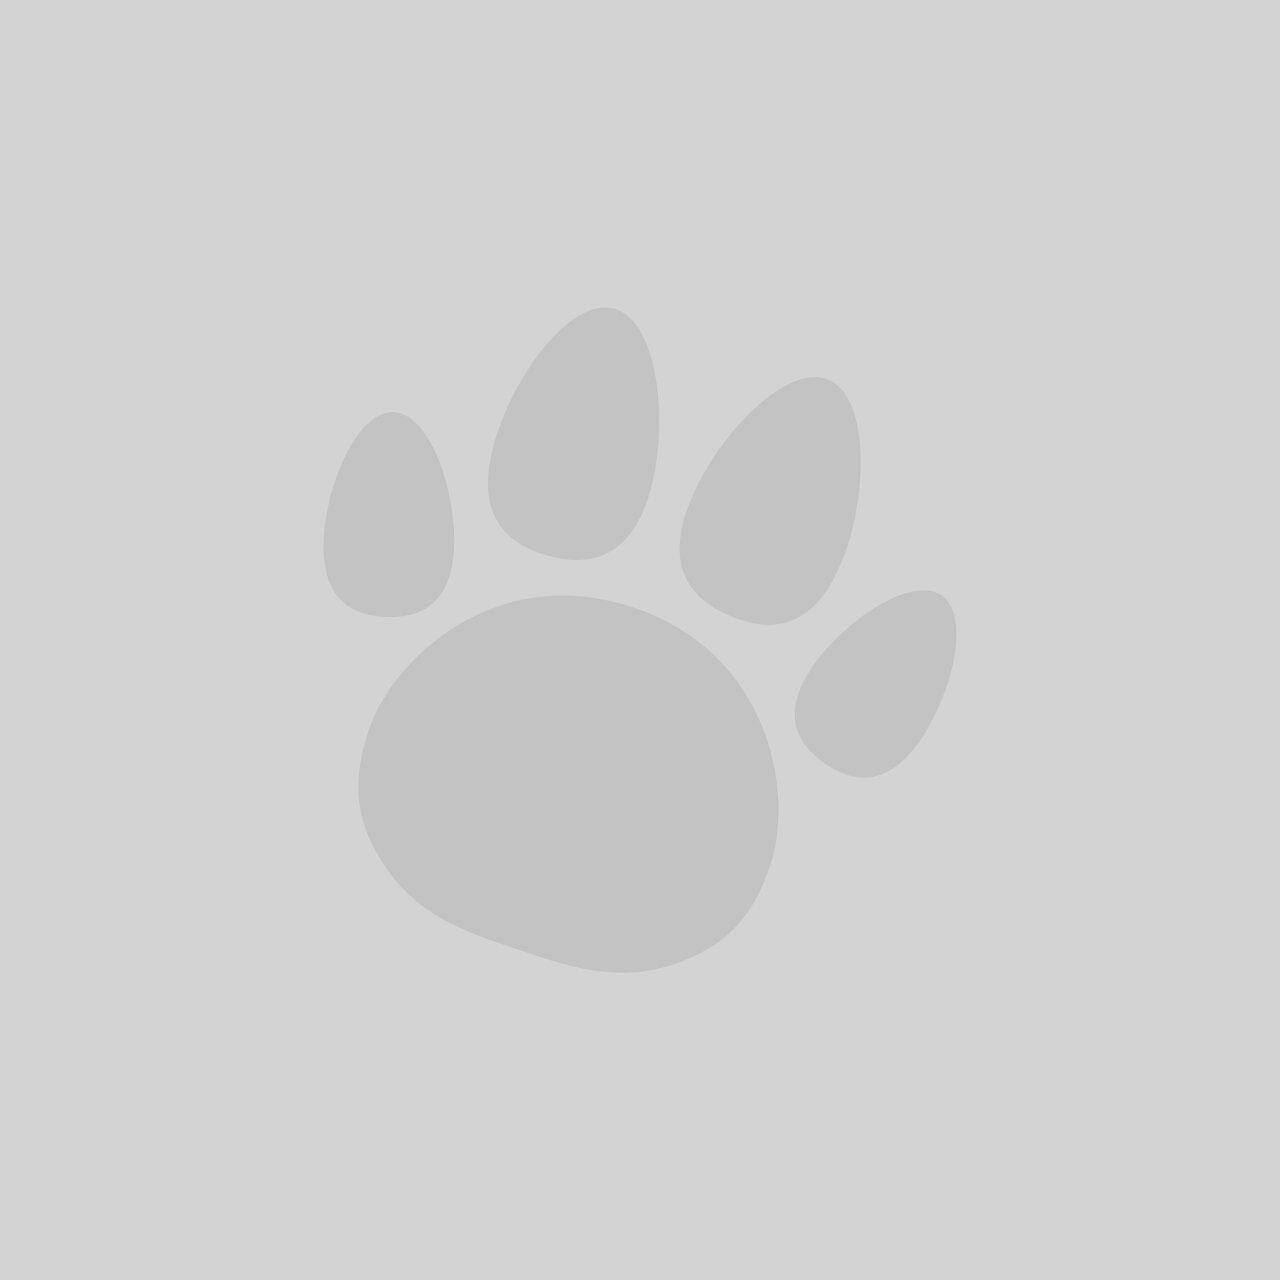 Iams Minis Dog Treats Beef & Apple 100g